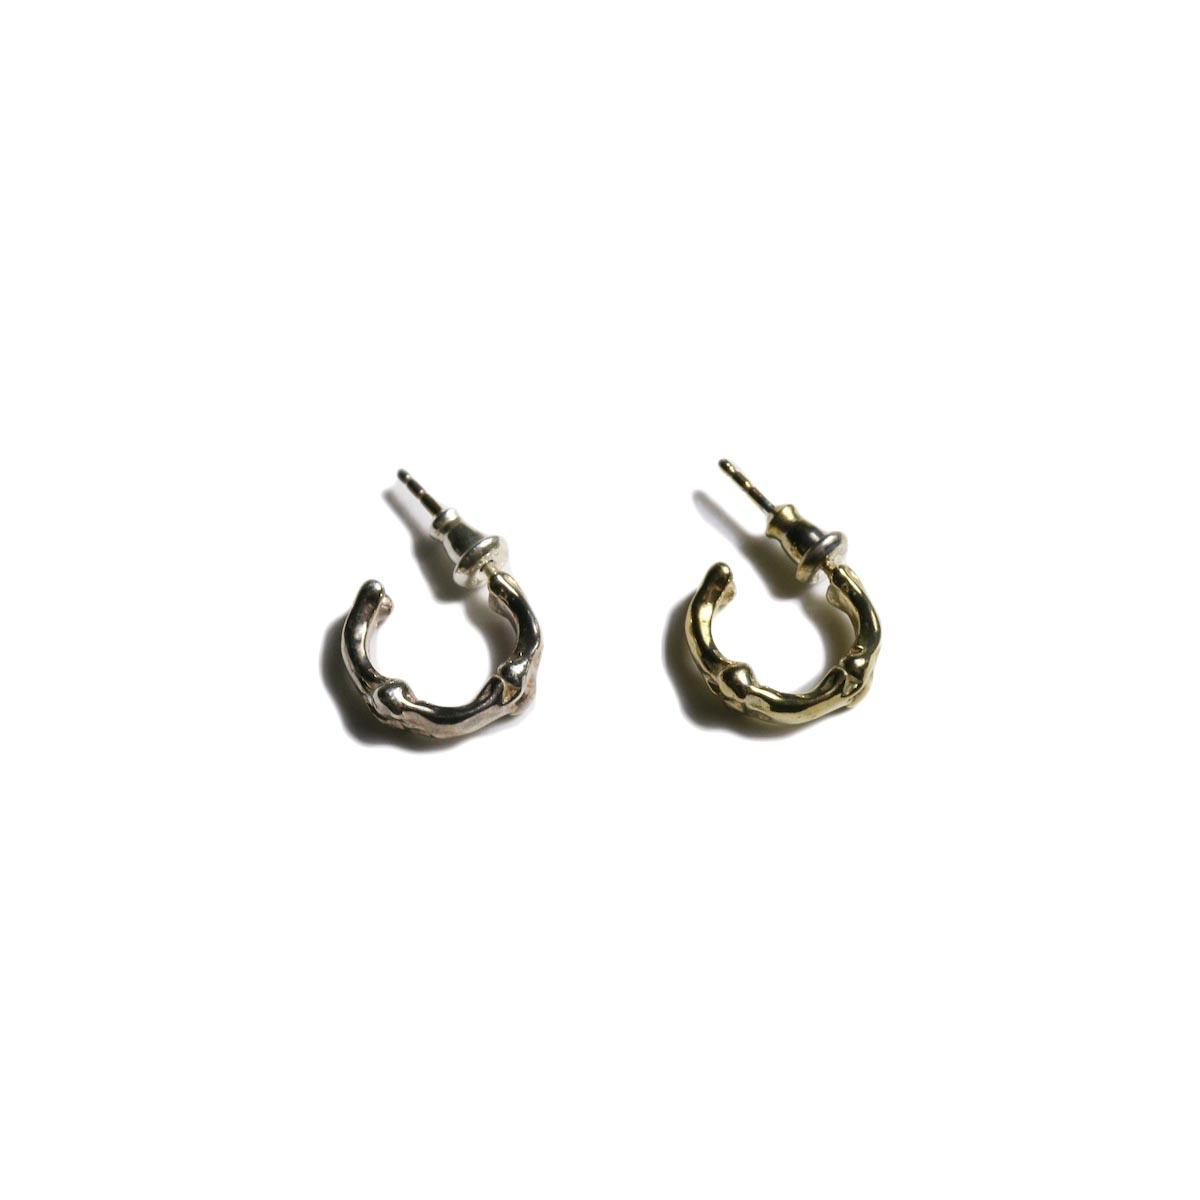 The Soloist / sa.0024SS20 bone shaped earrings.